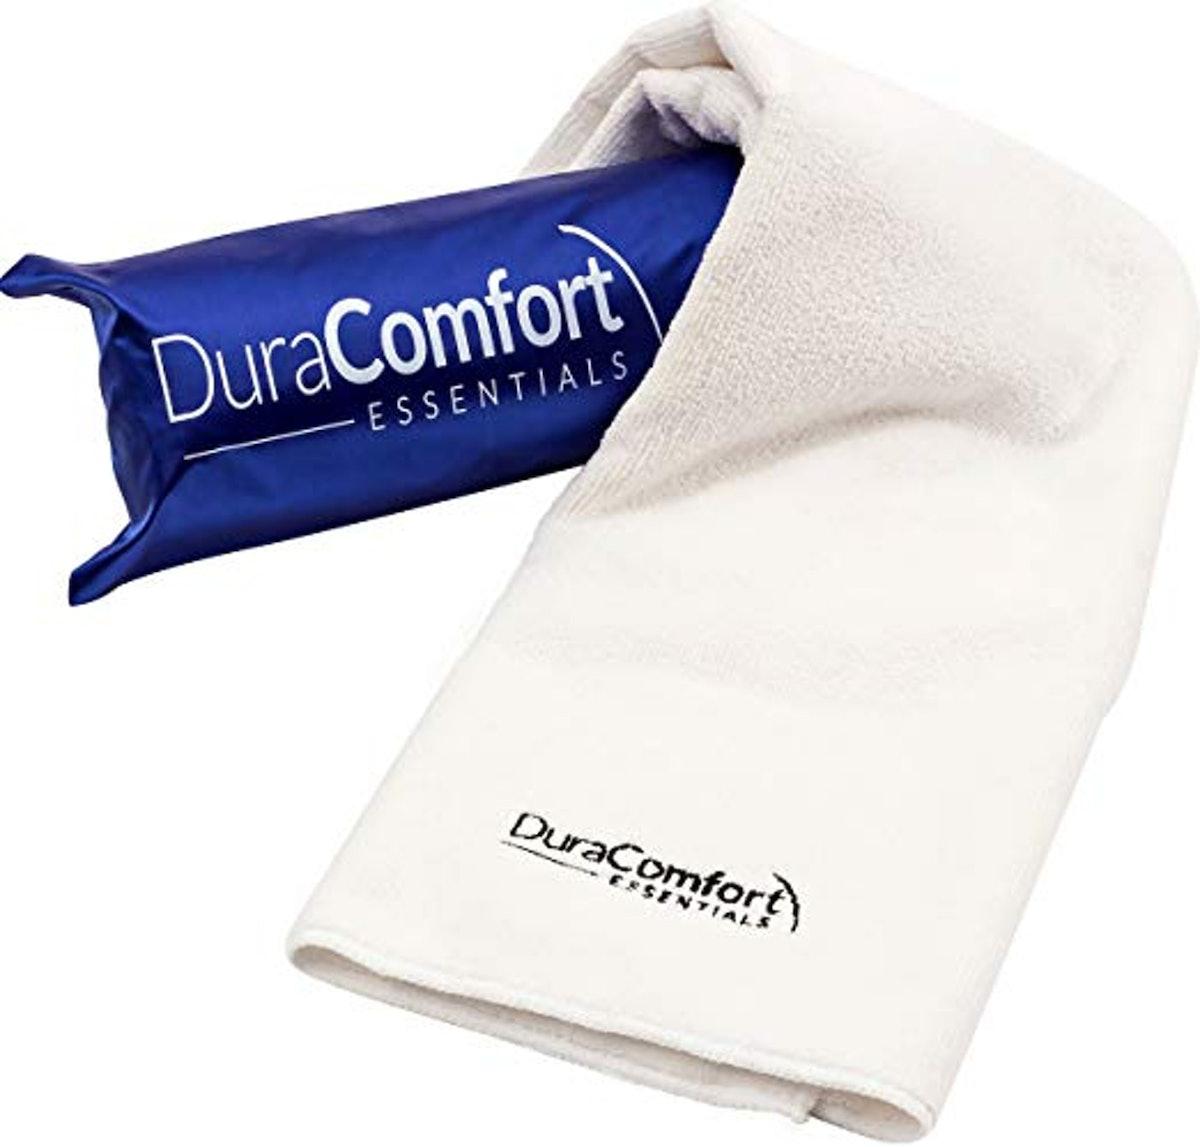 DuraComfort Essentials Super Absorbent Hair Towel